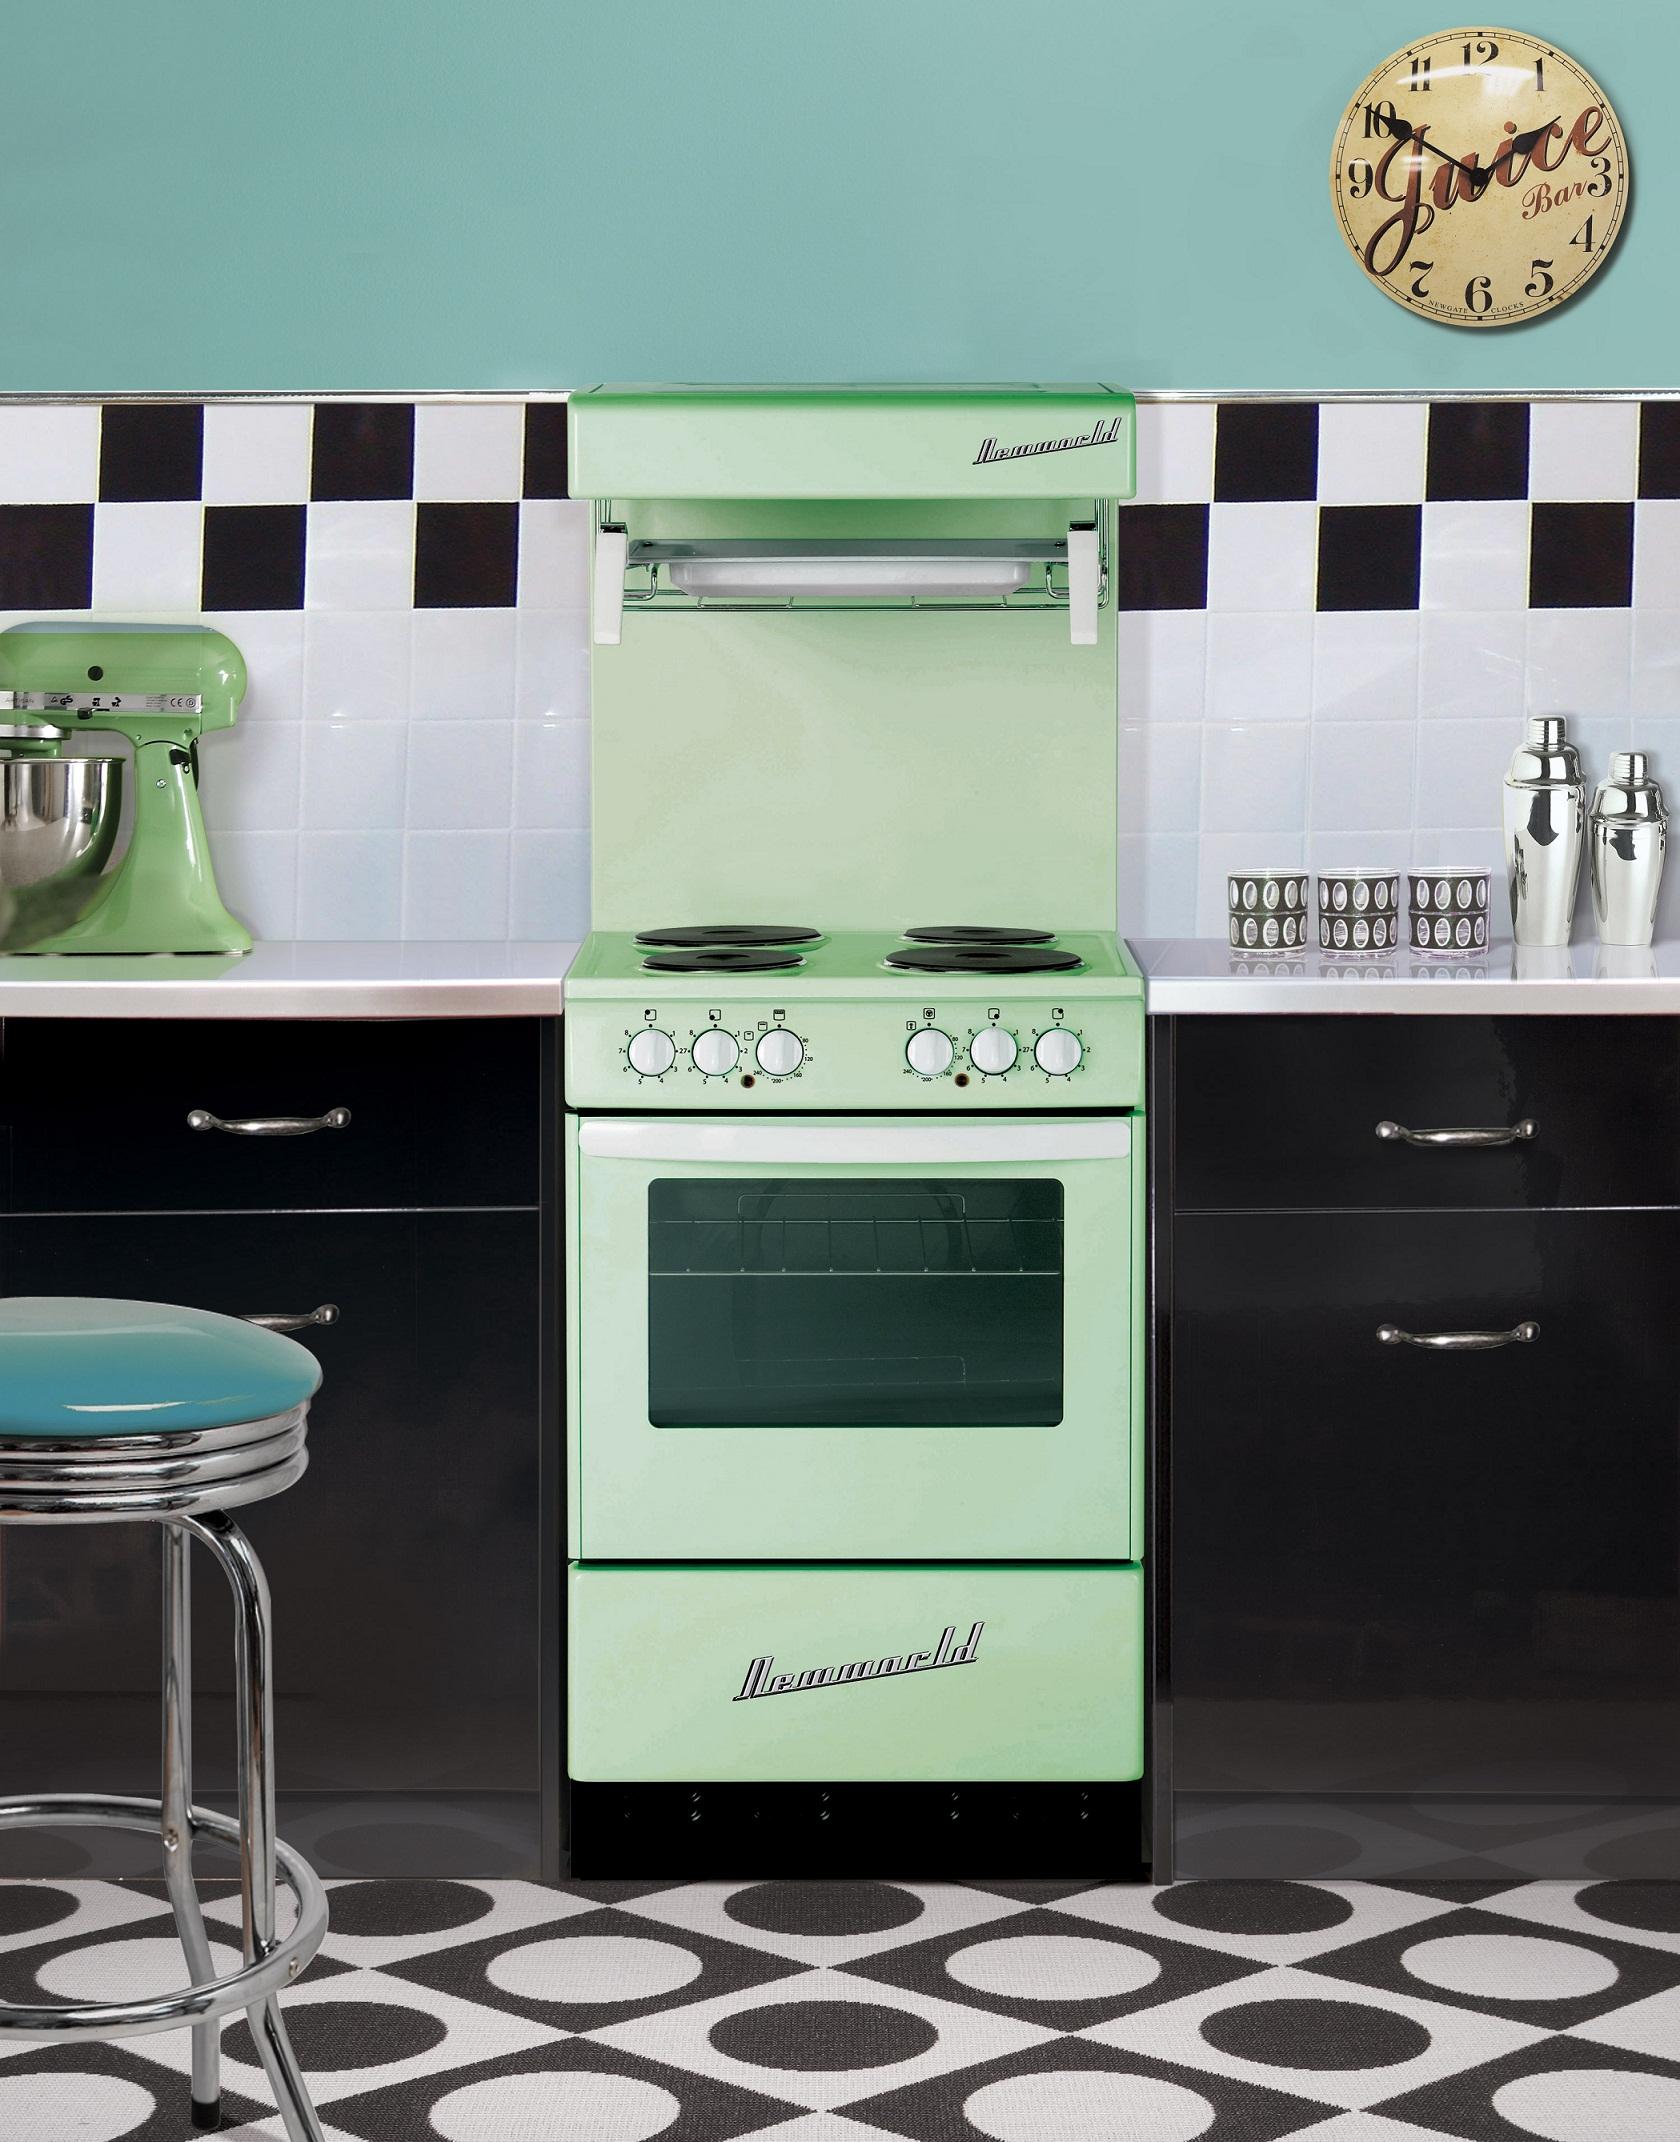 New World Kitchen Appliances New World Takes Retro To A New Level